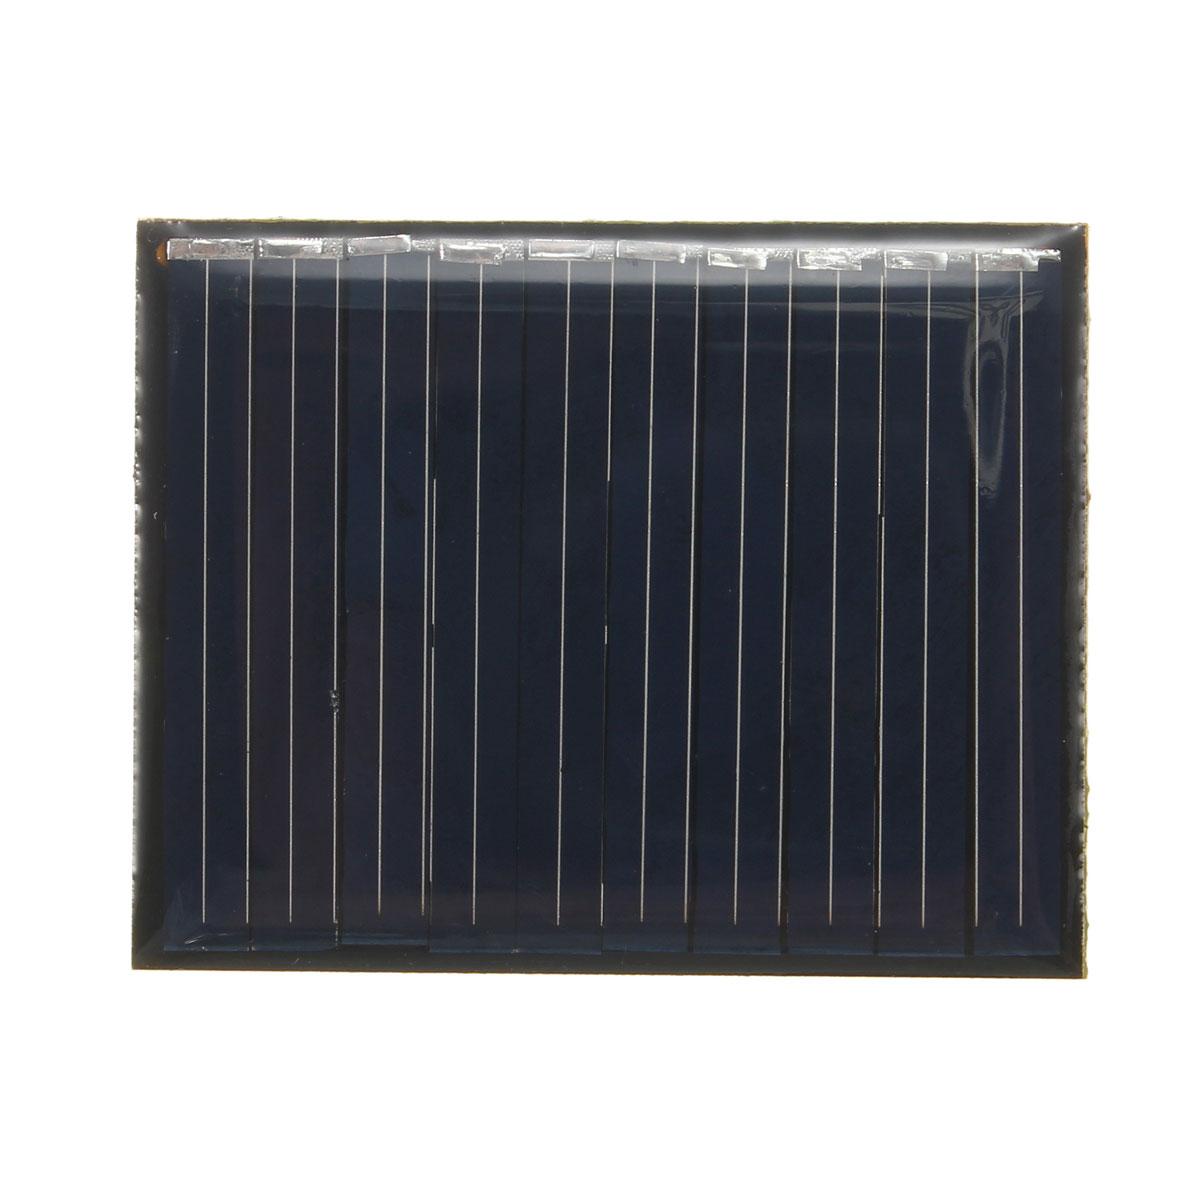 LEORY High quality Polycrystalline 5V 0.2W Solar Energy Power Solar Panel Module System Solar Cells Charger 4.3x3.4x0.2cm